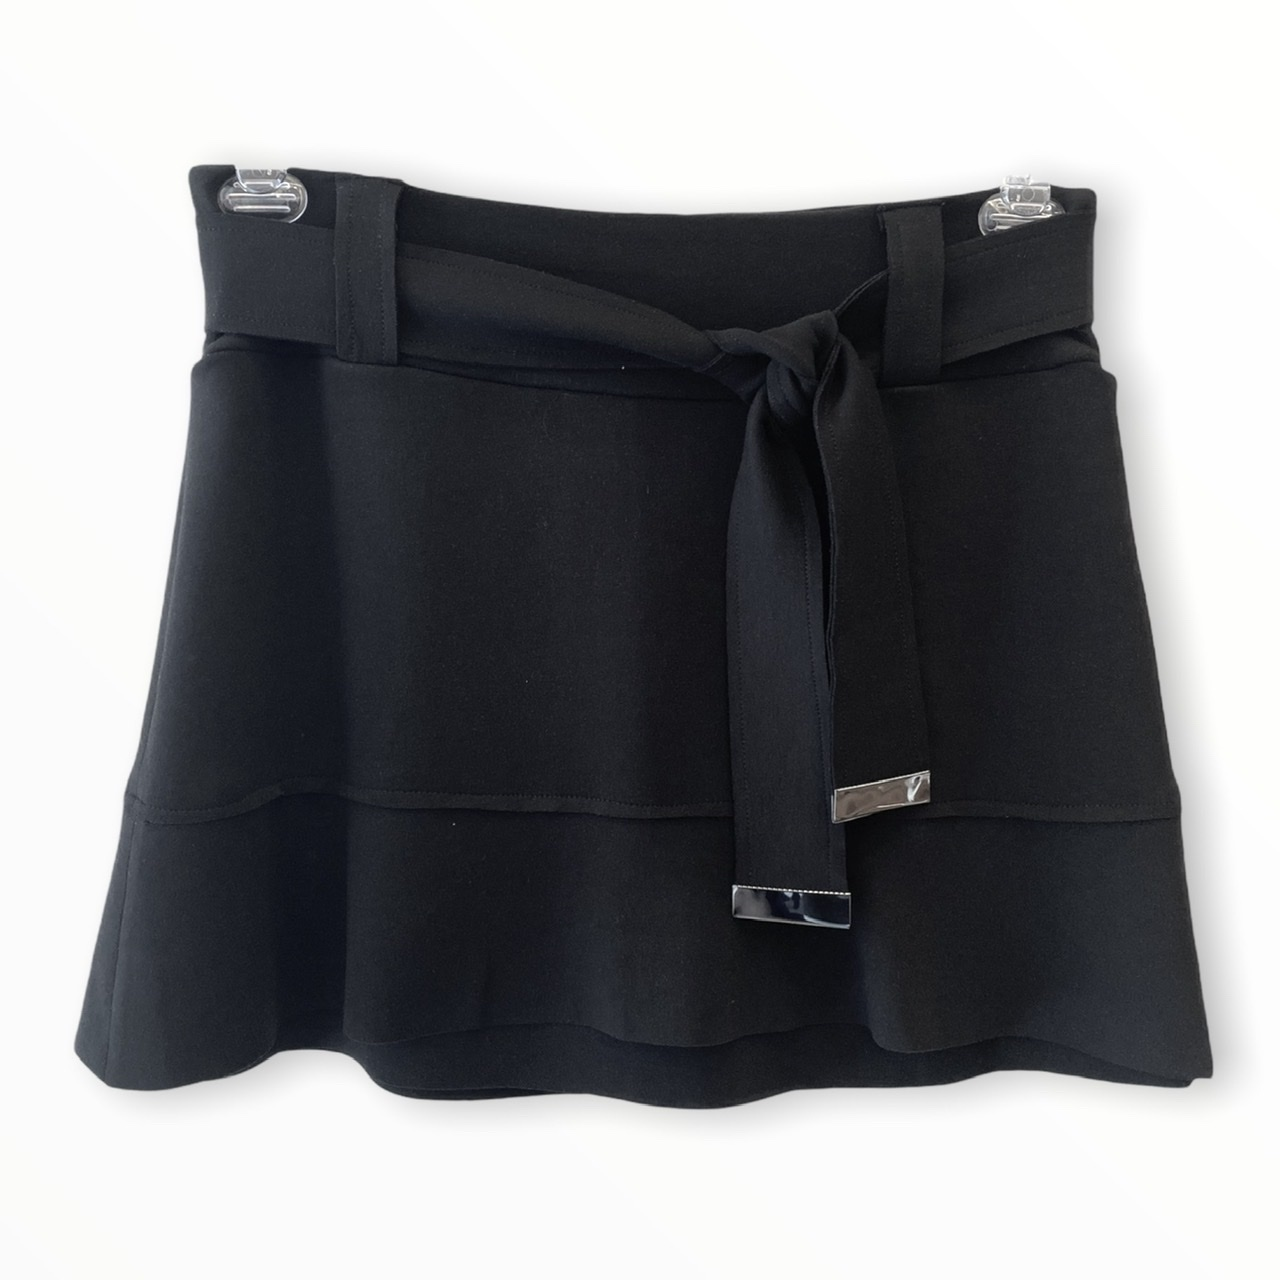 Saia shorts Helô preta